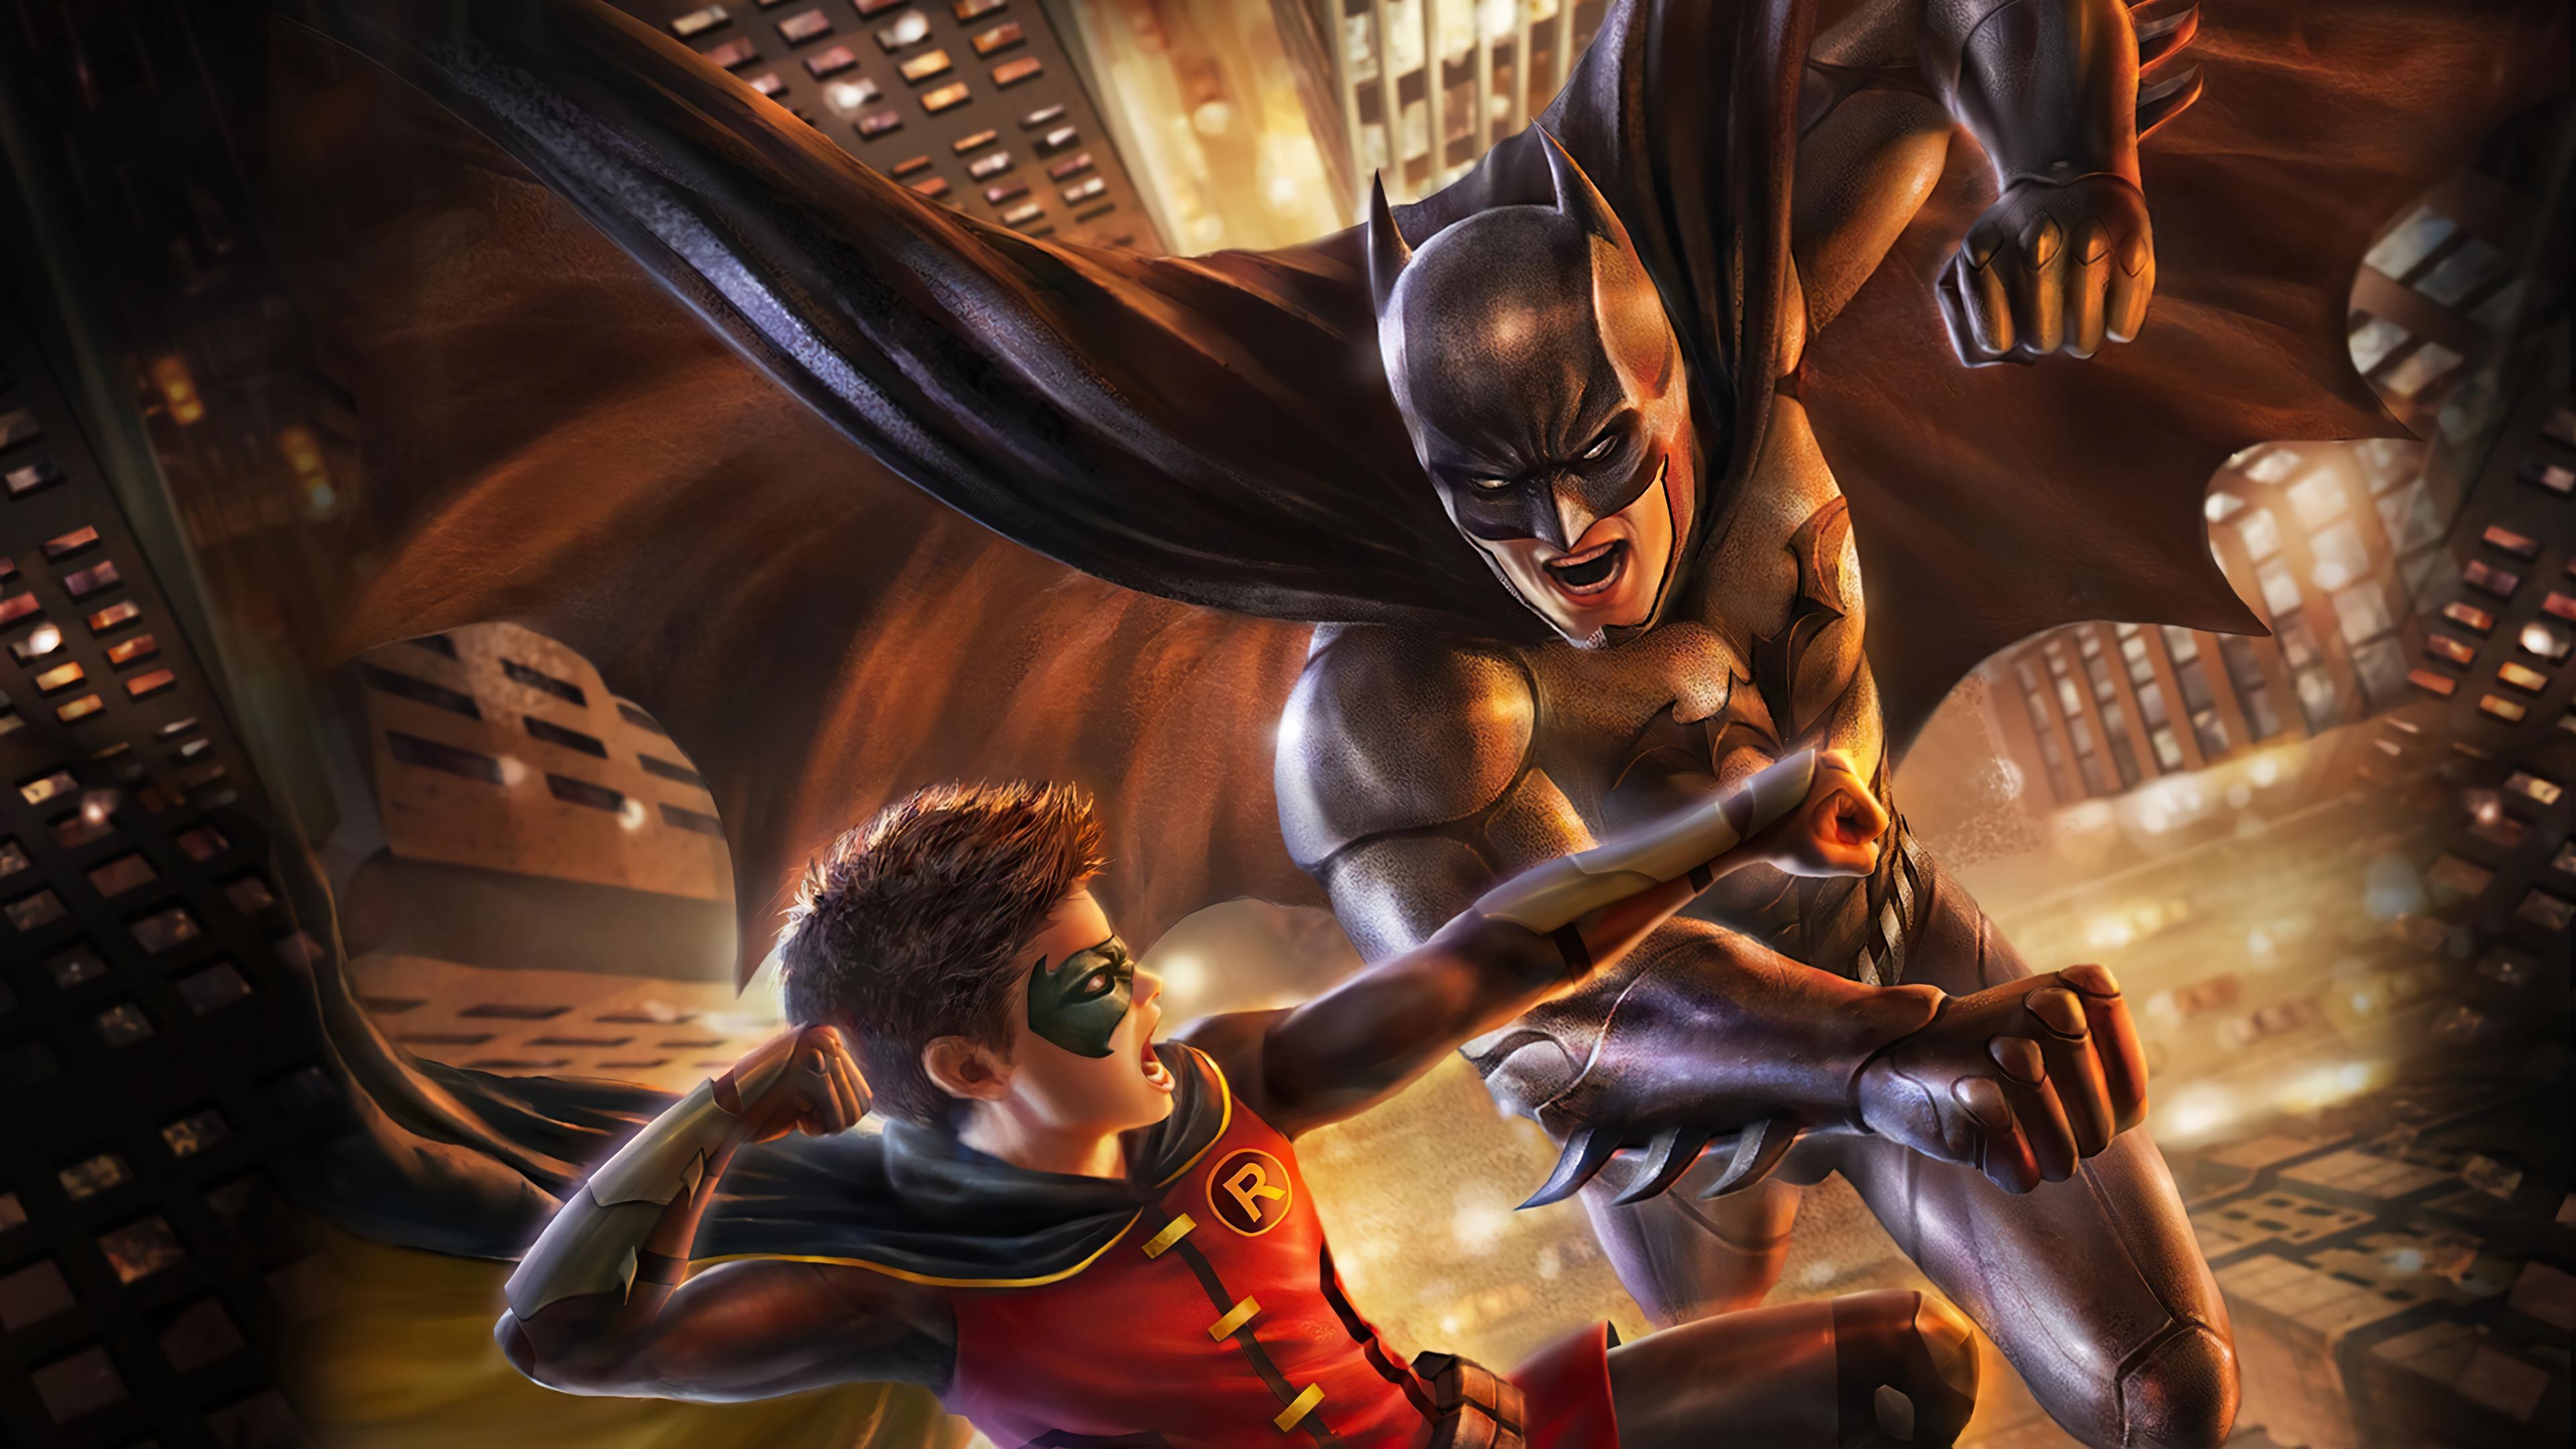 Batman Robin Dc Comics Damian Wayne 3840x2160